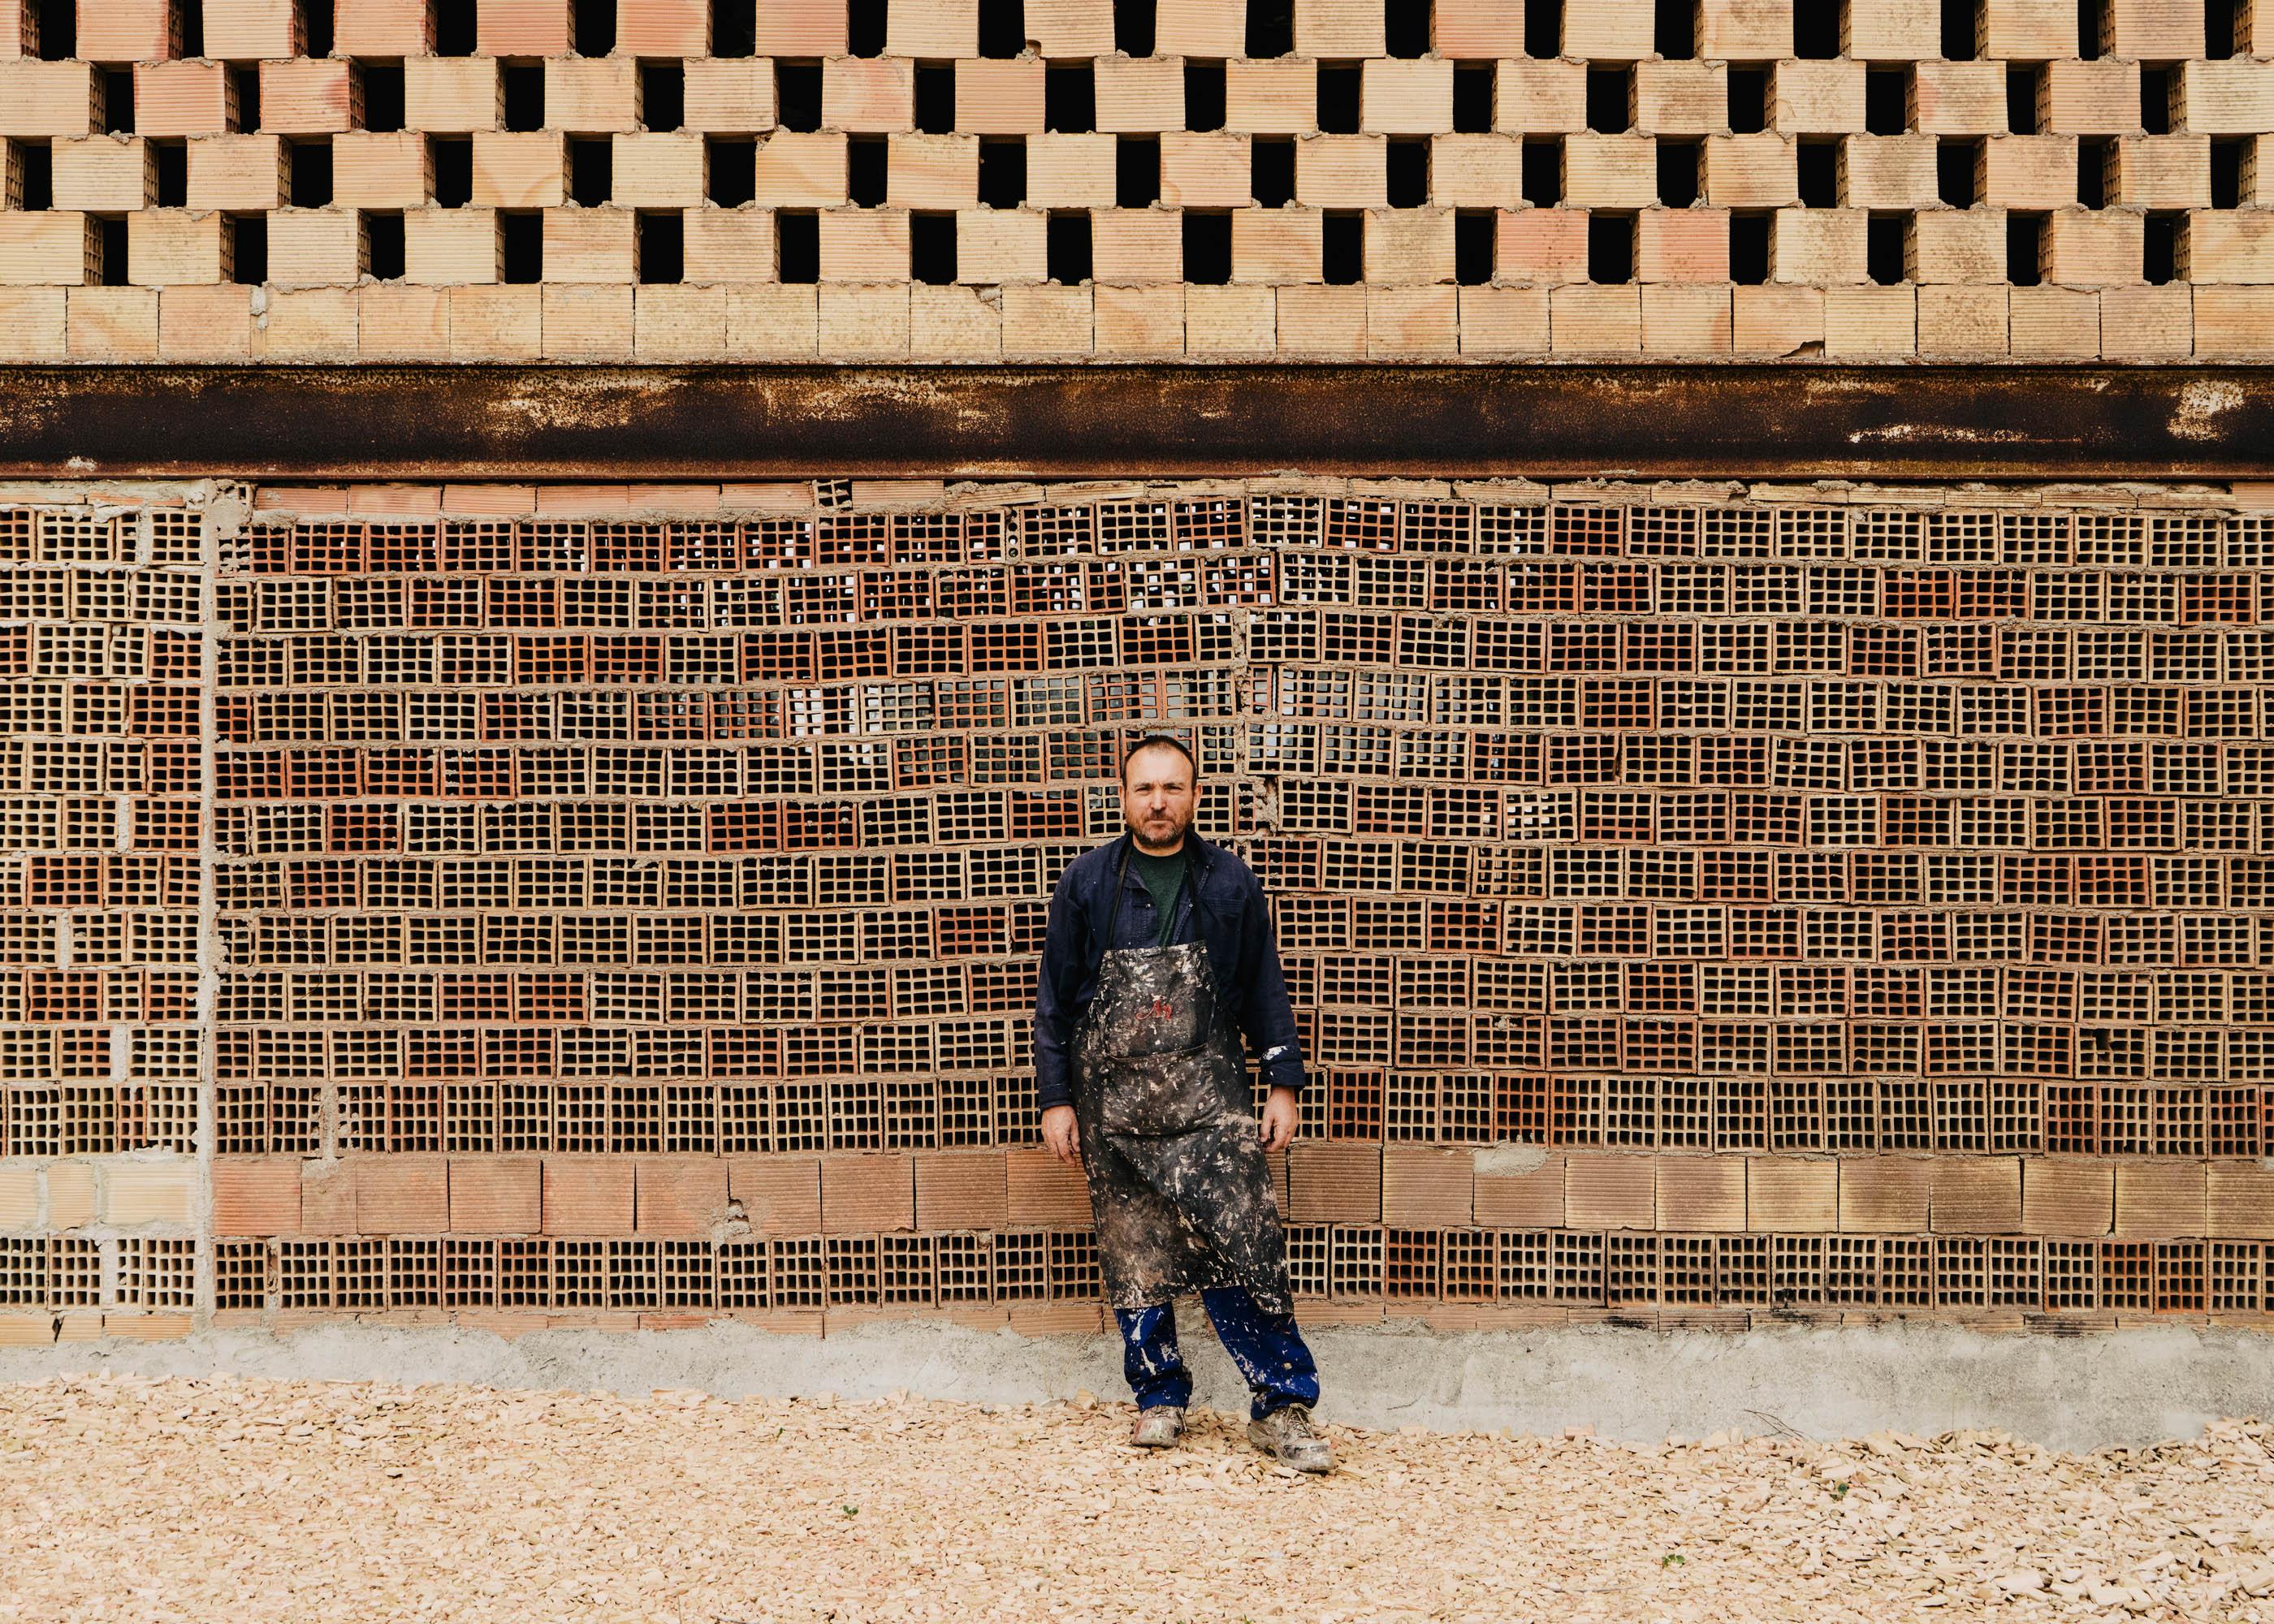 #portraits #miquel #barcelo #ceramics #studio #artist #mallorca #editorial #wsj #wallstreetjournal